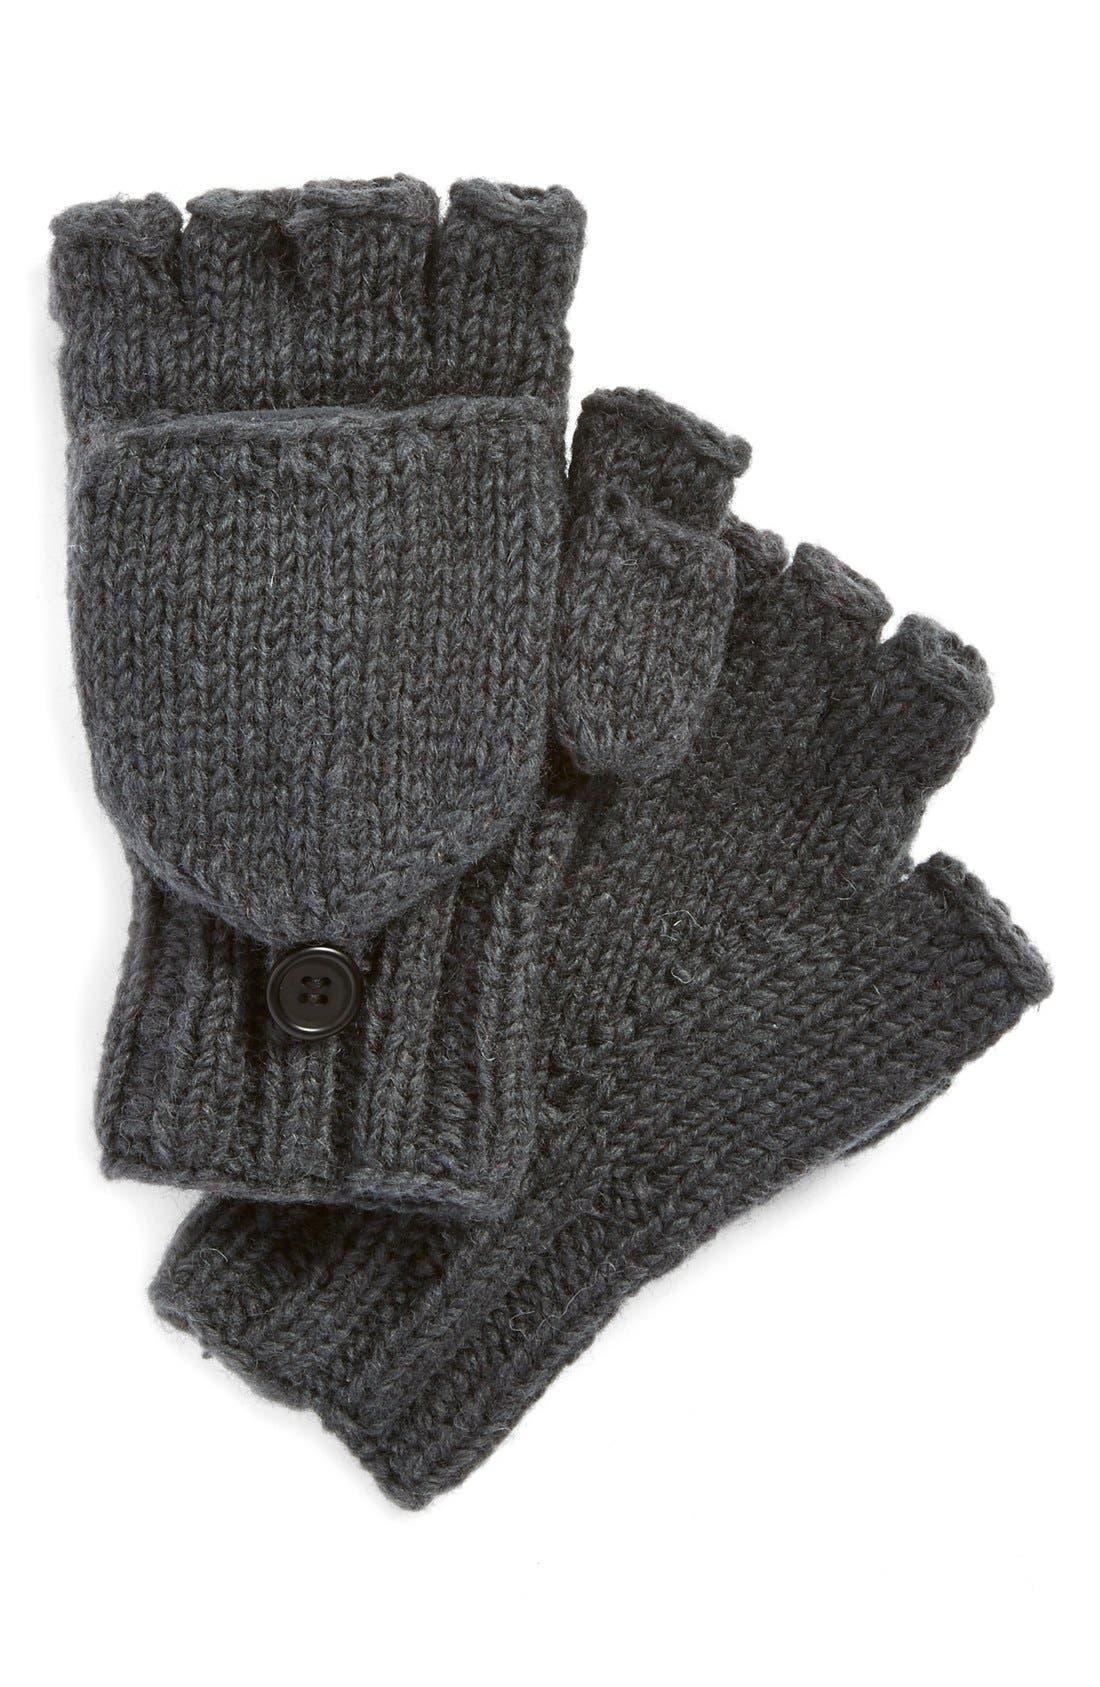 Alternate Image 1 Selected - Nirvanna Designs Convertible Fingerless Gloves